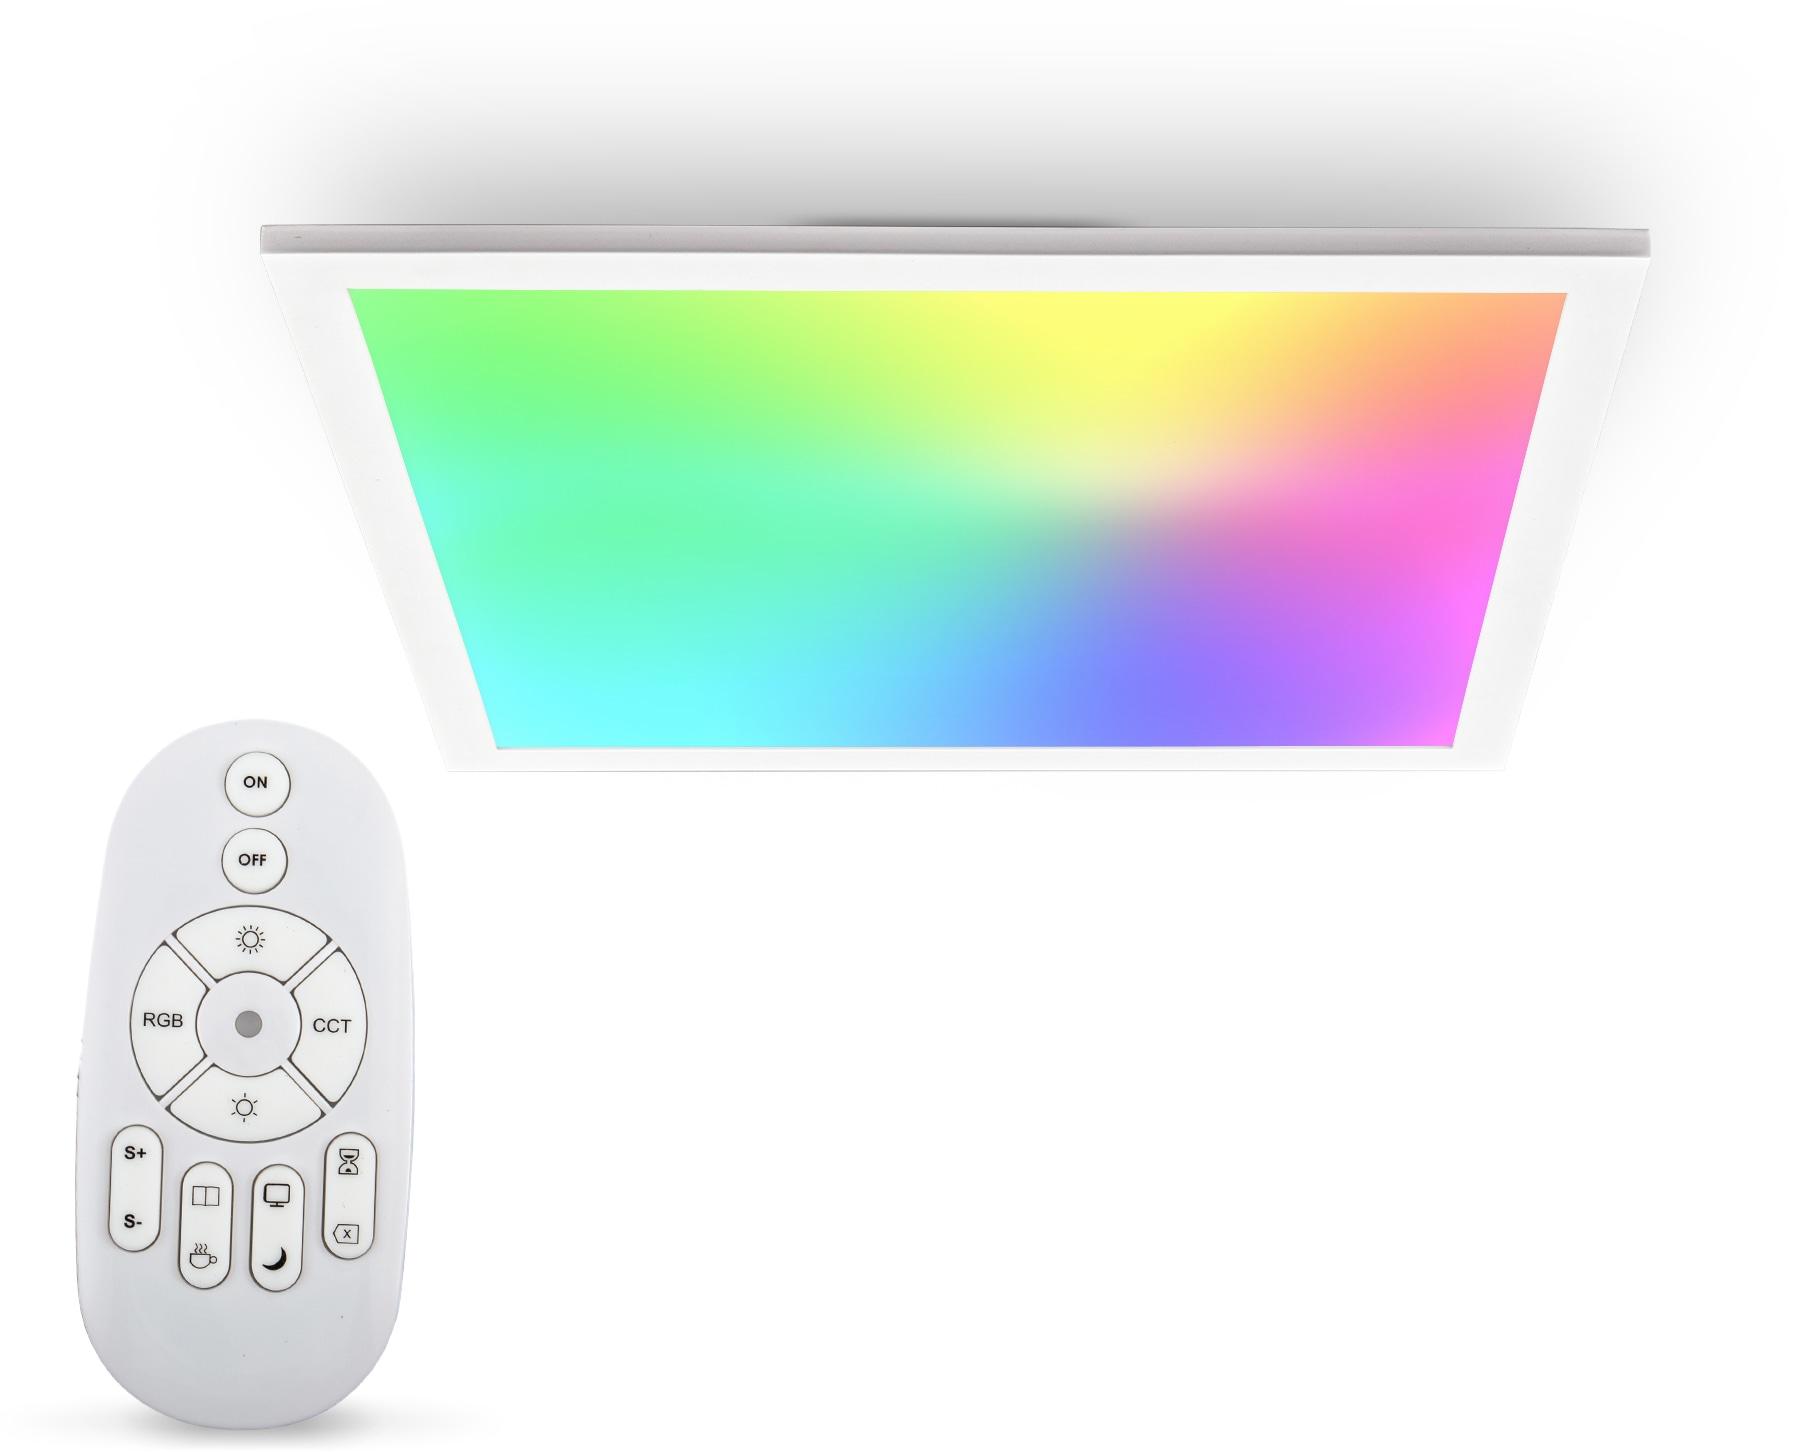 B.K.Licht Deckenleuchte, LED-Board, 1 St., LED Panel, Farbtemperatur, stufenlos einstellbar, 450x450x42mm, 7 Farben, Ultra Flach, Dimmbar, Fernbedienung